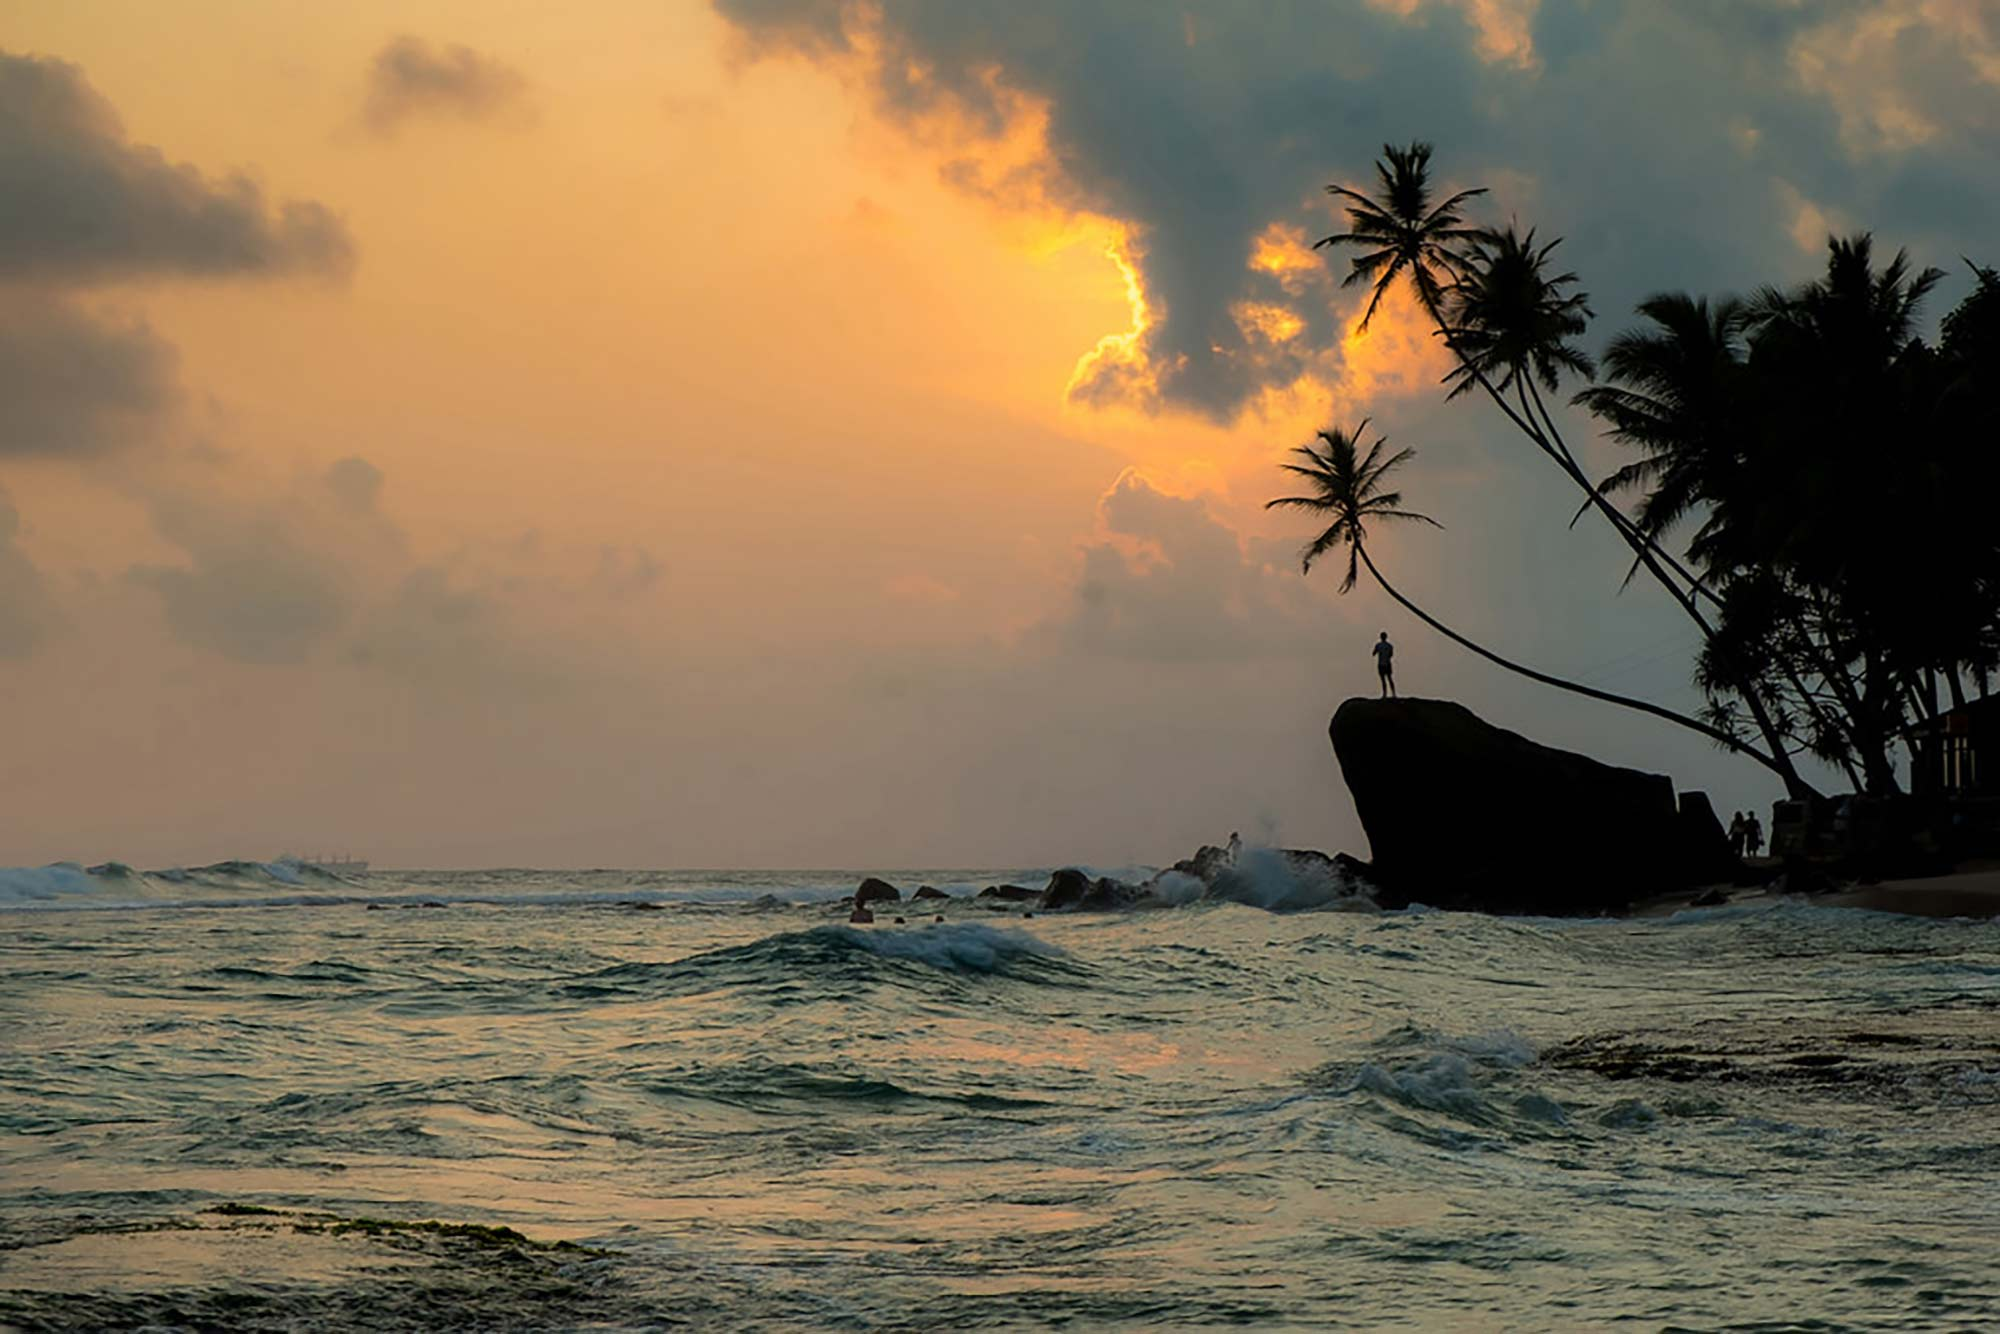 https://www.soulandsurf.com/wp-content/uploads/2021/08/Lanka-Guide-Images-Wijaya-Beach-pc-G.S.-Matthews.jpg